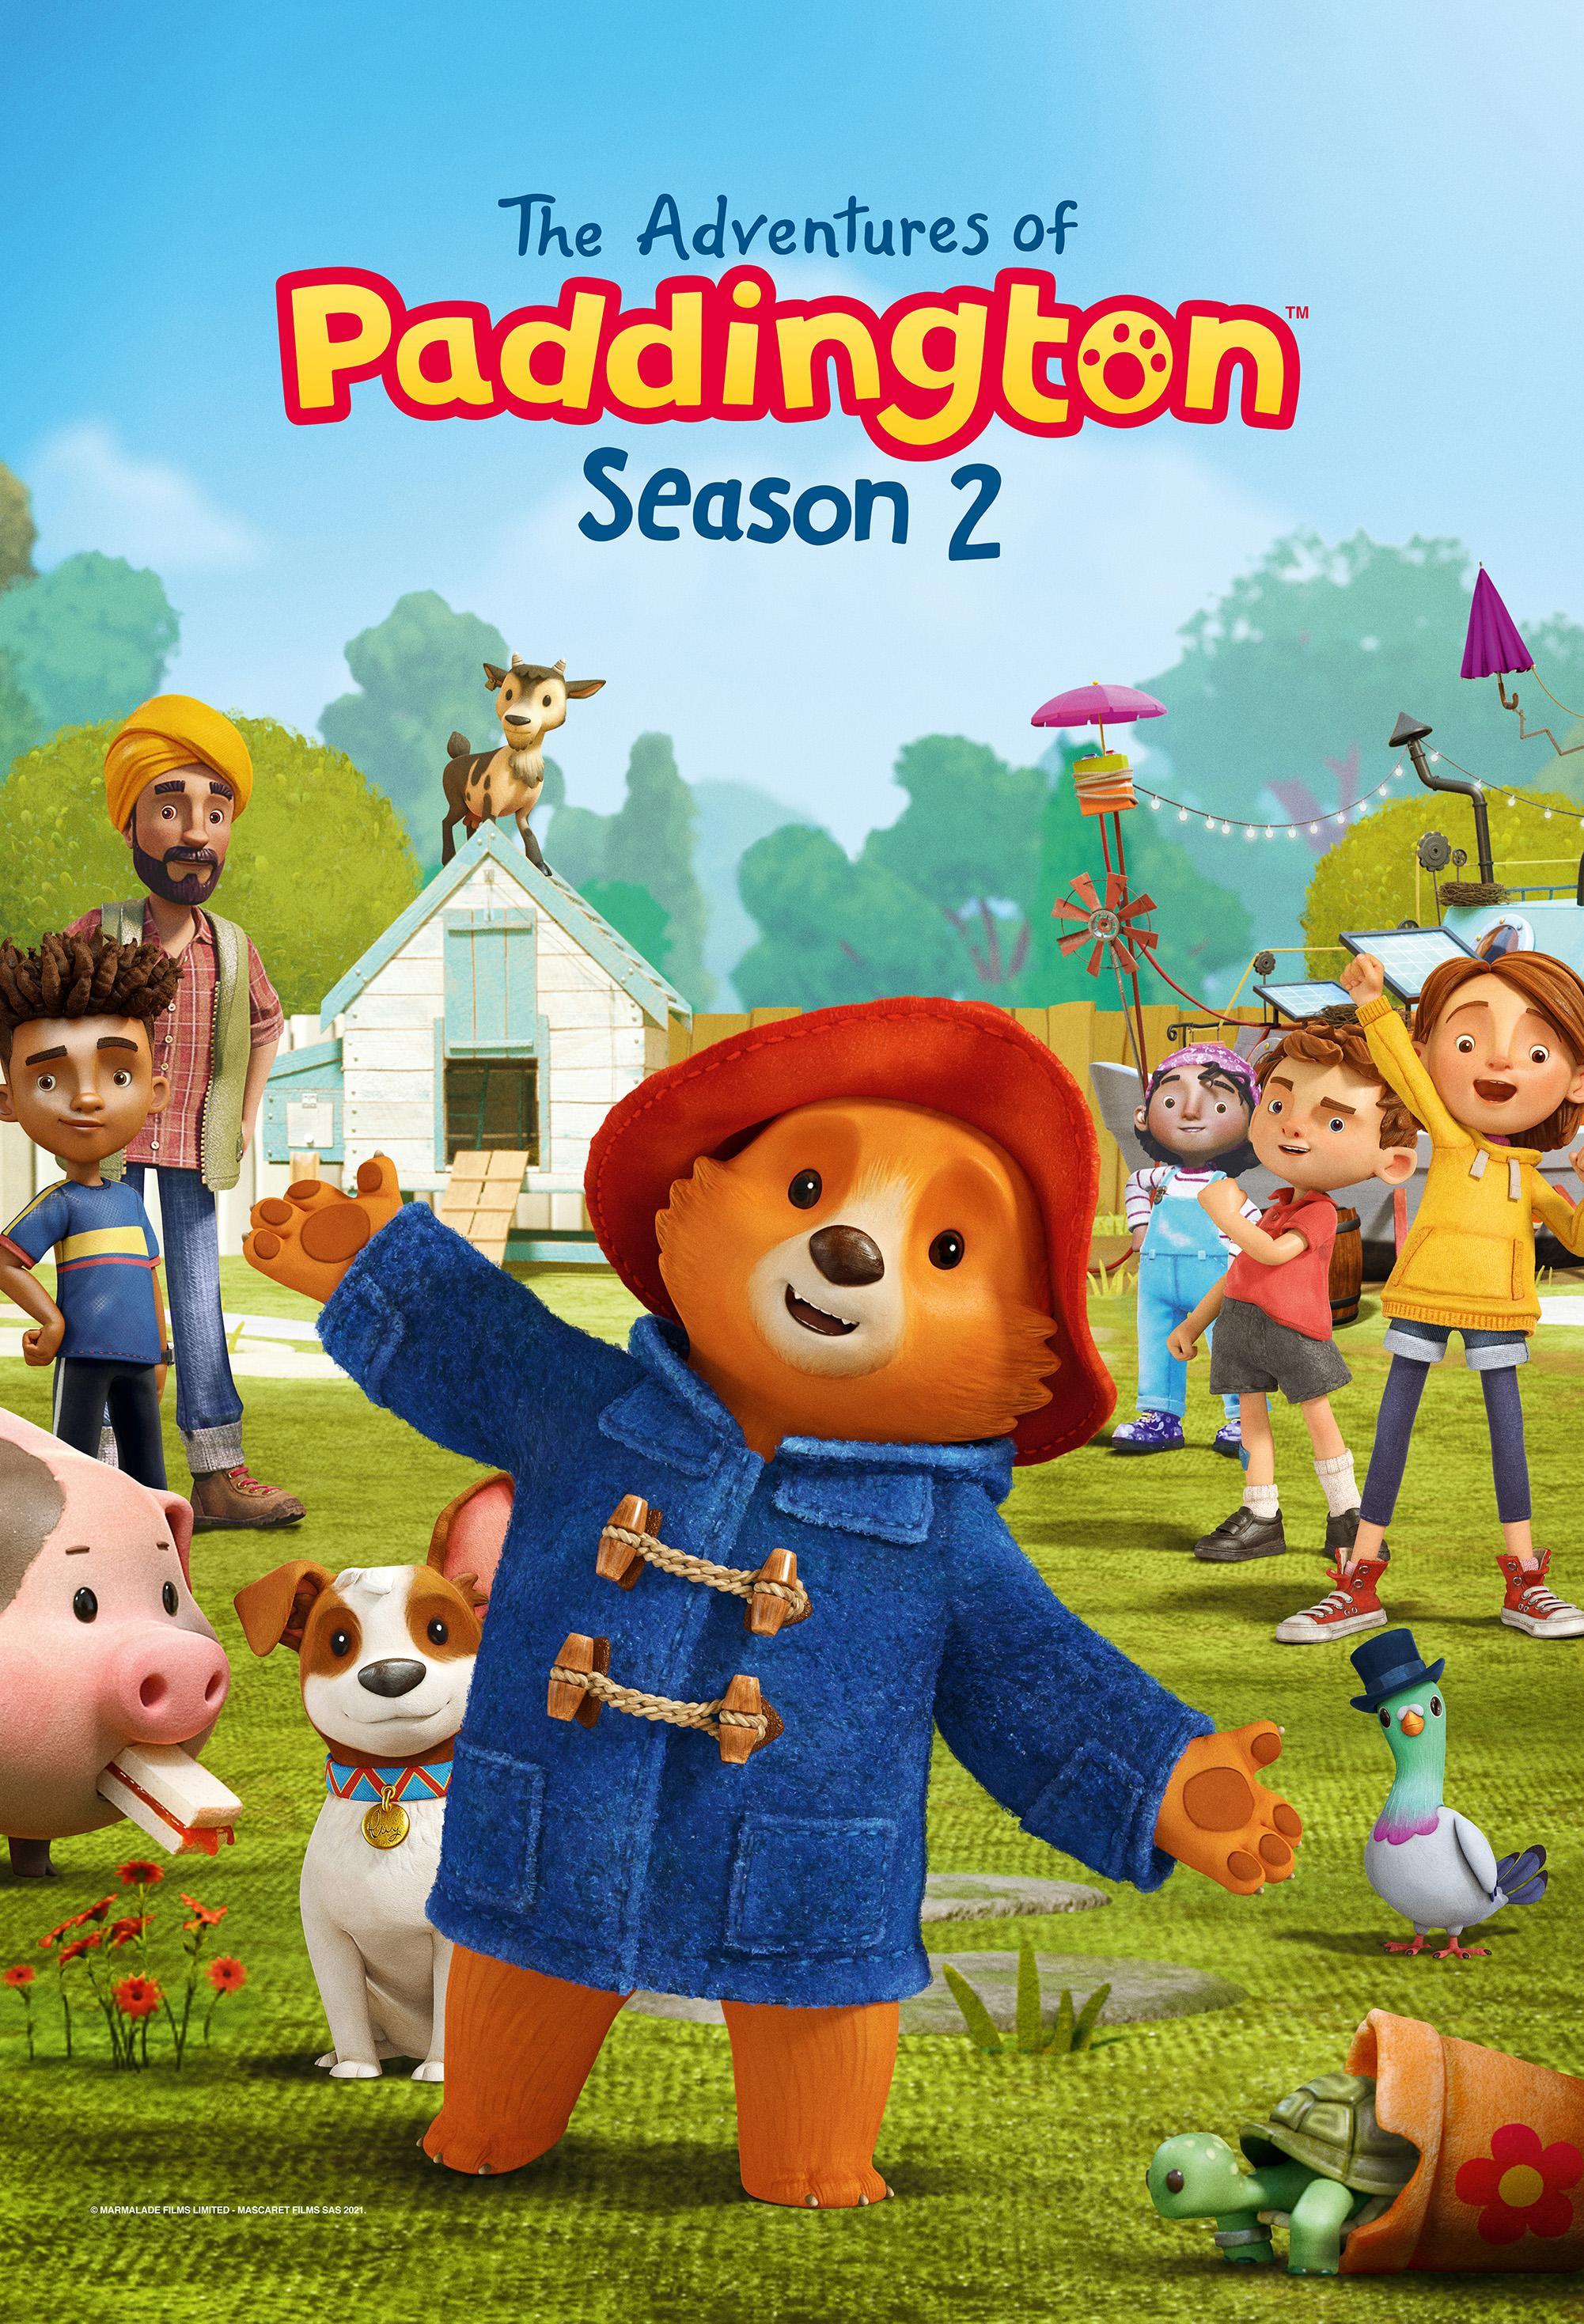 The Adventures of Paddington - Season 2